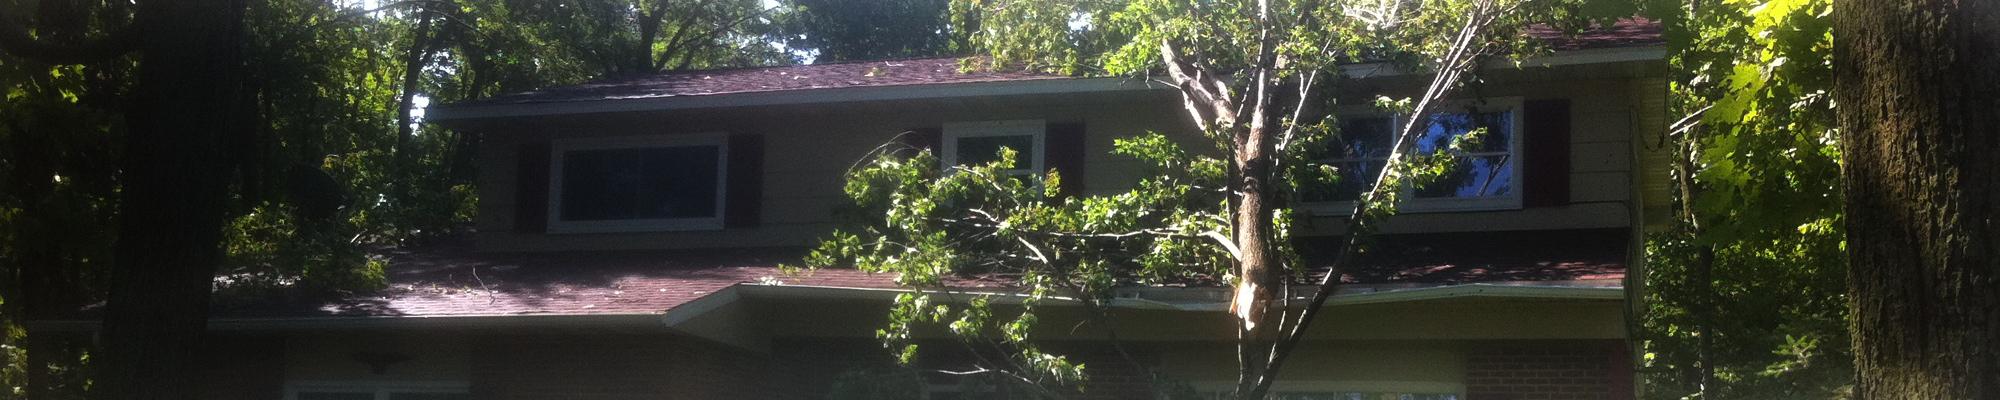 Storm Damage Restoration in Wisconsin